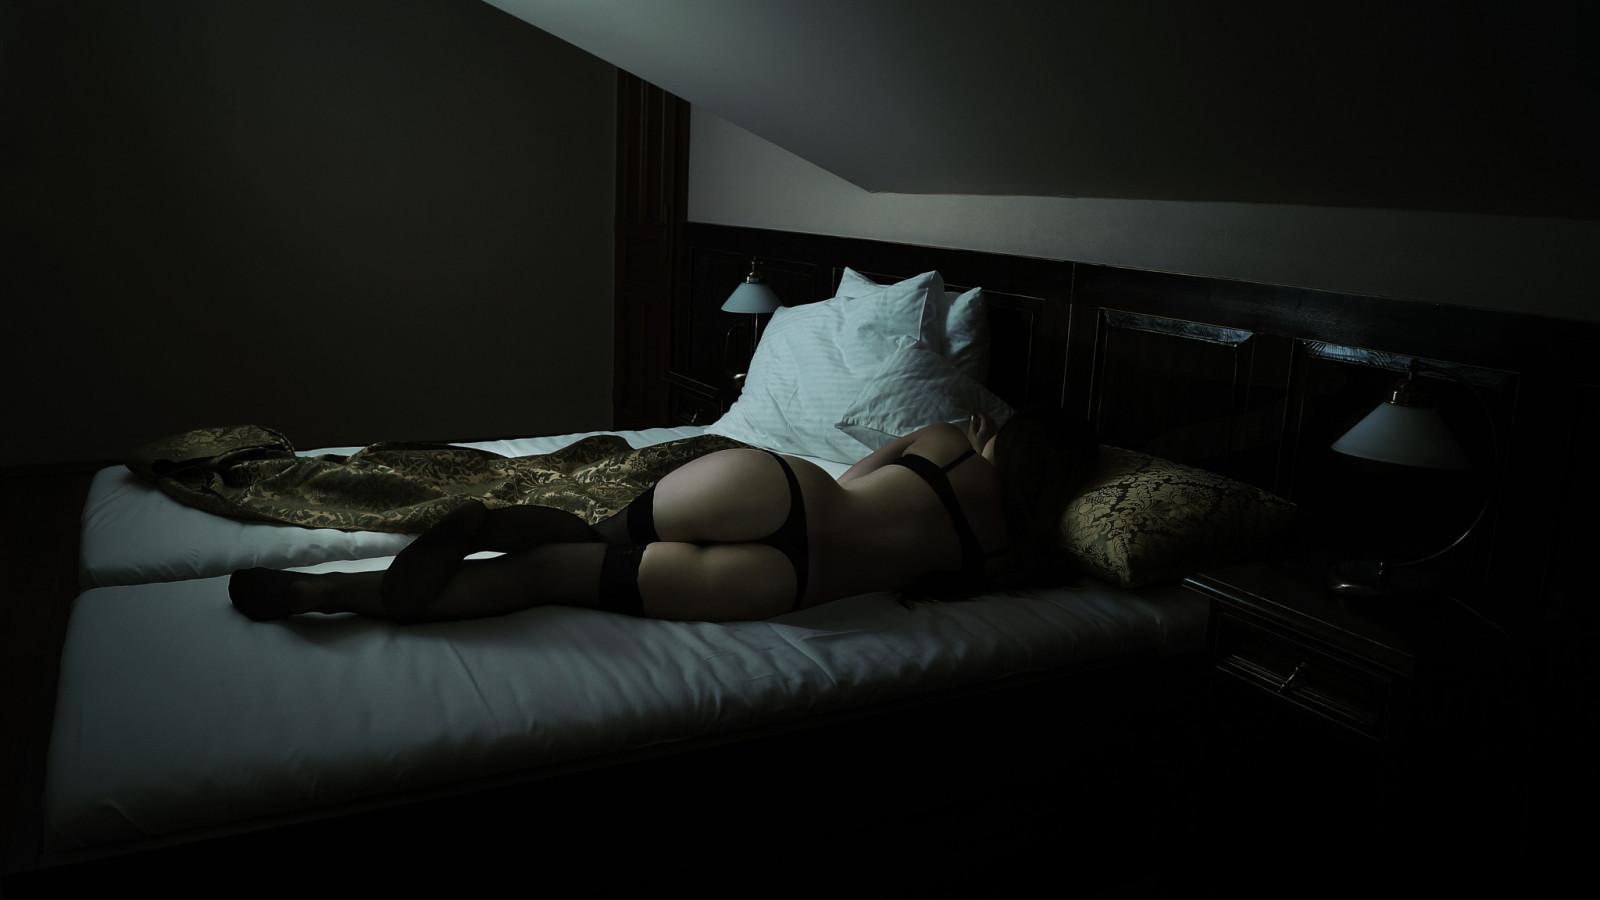 Ебут жопу фото ночью девушки в кровати старушек так жгут